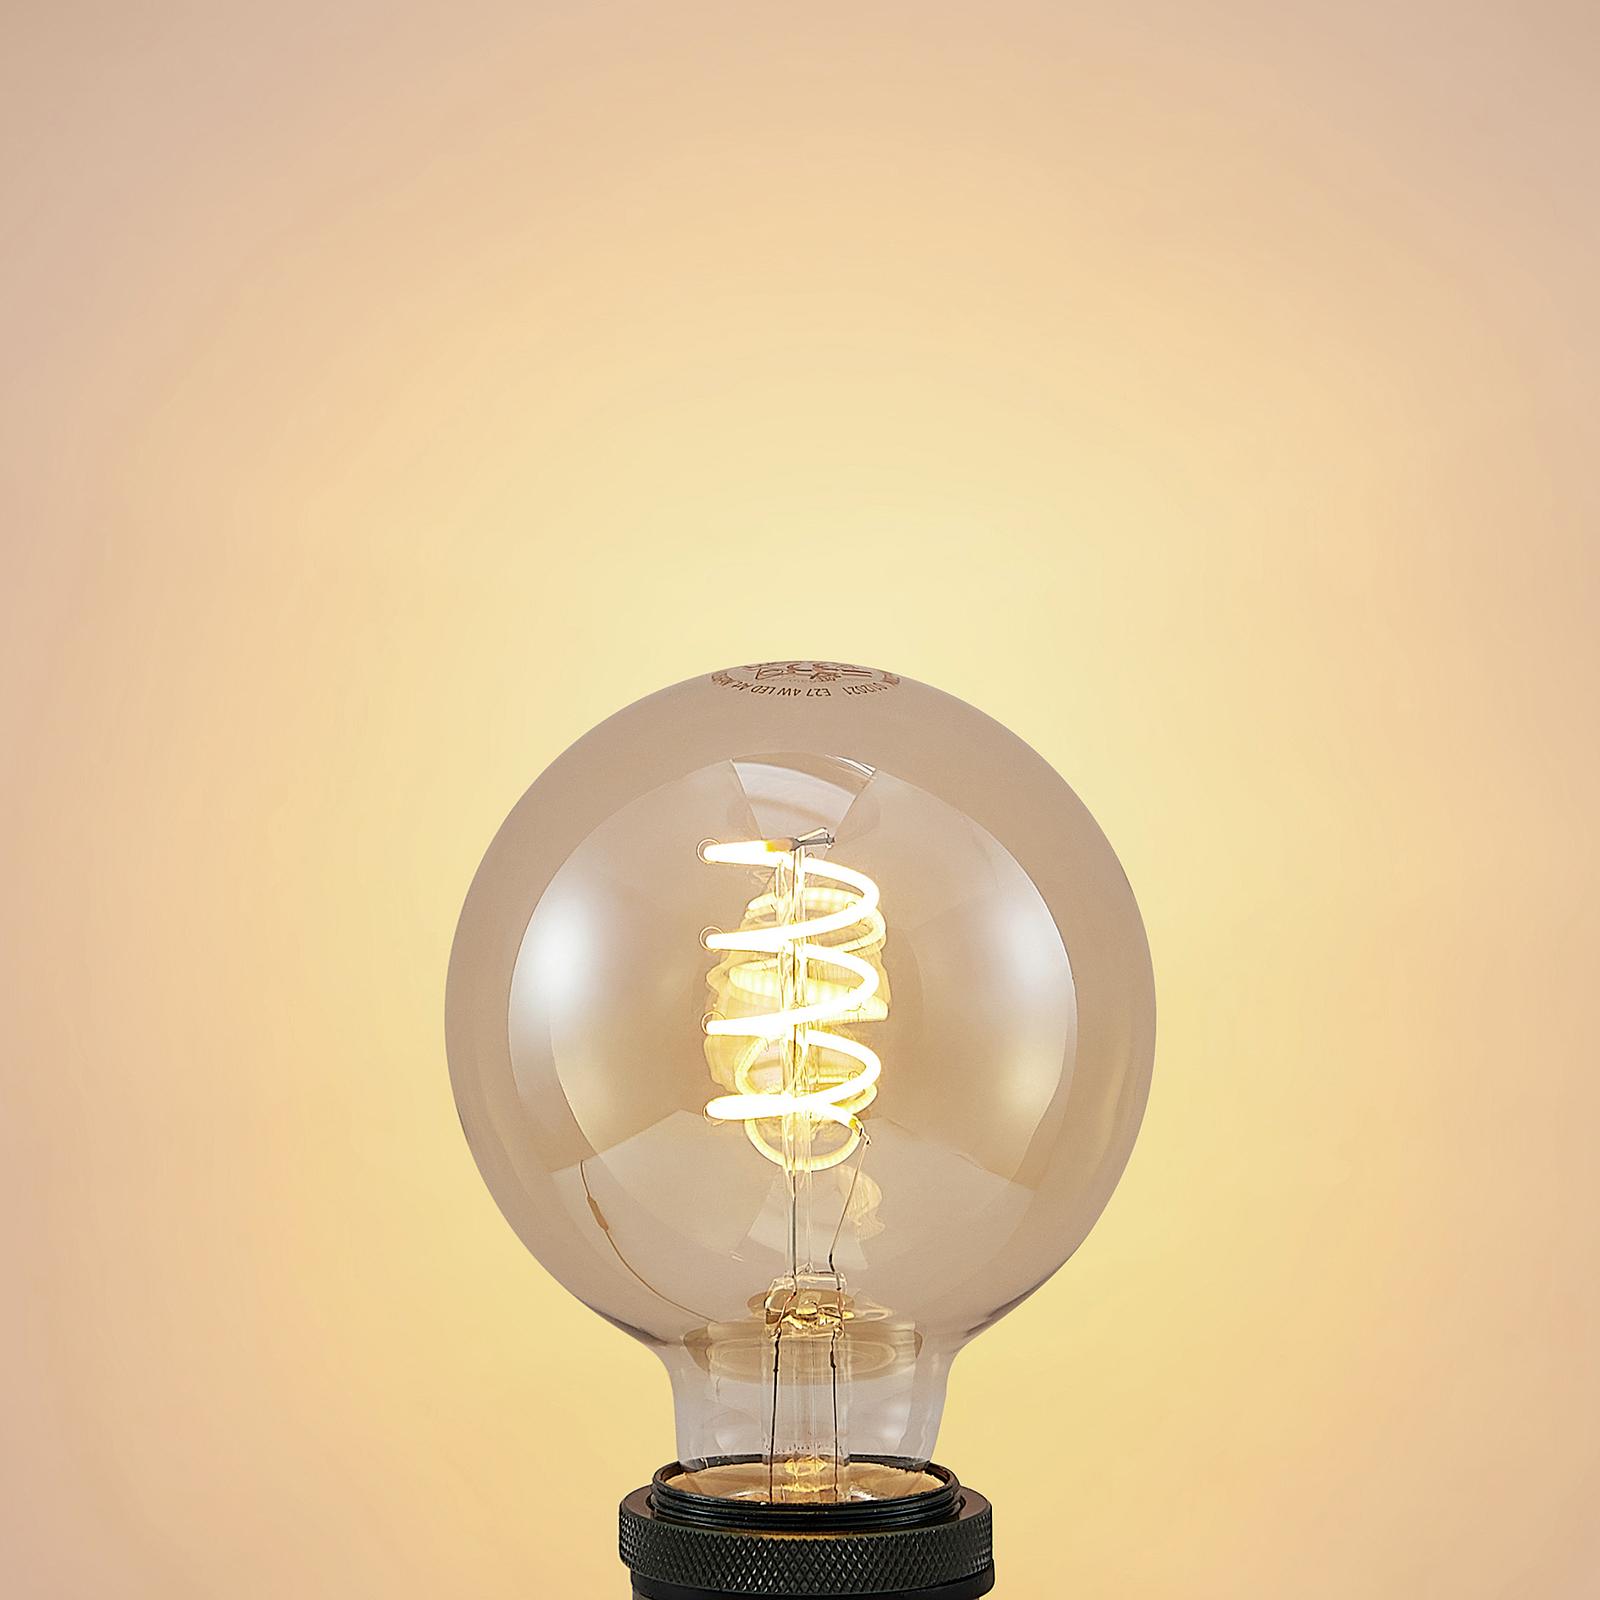 Lucande LED-pære E27 G95 4 W 2200K dimbar rav